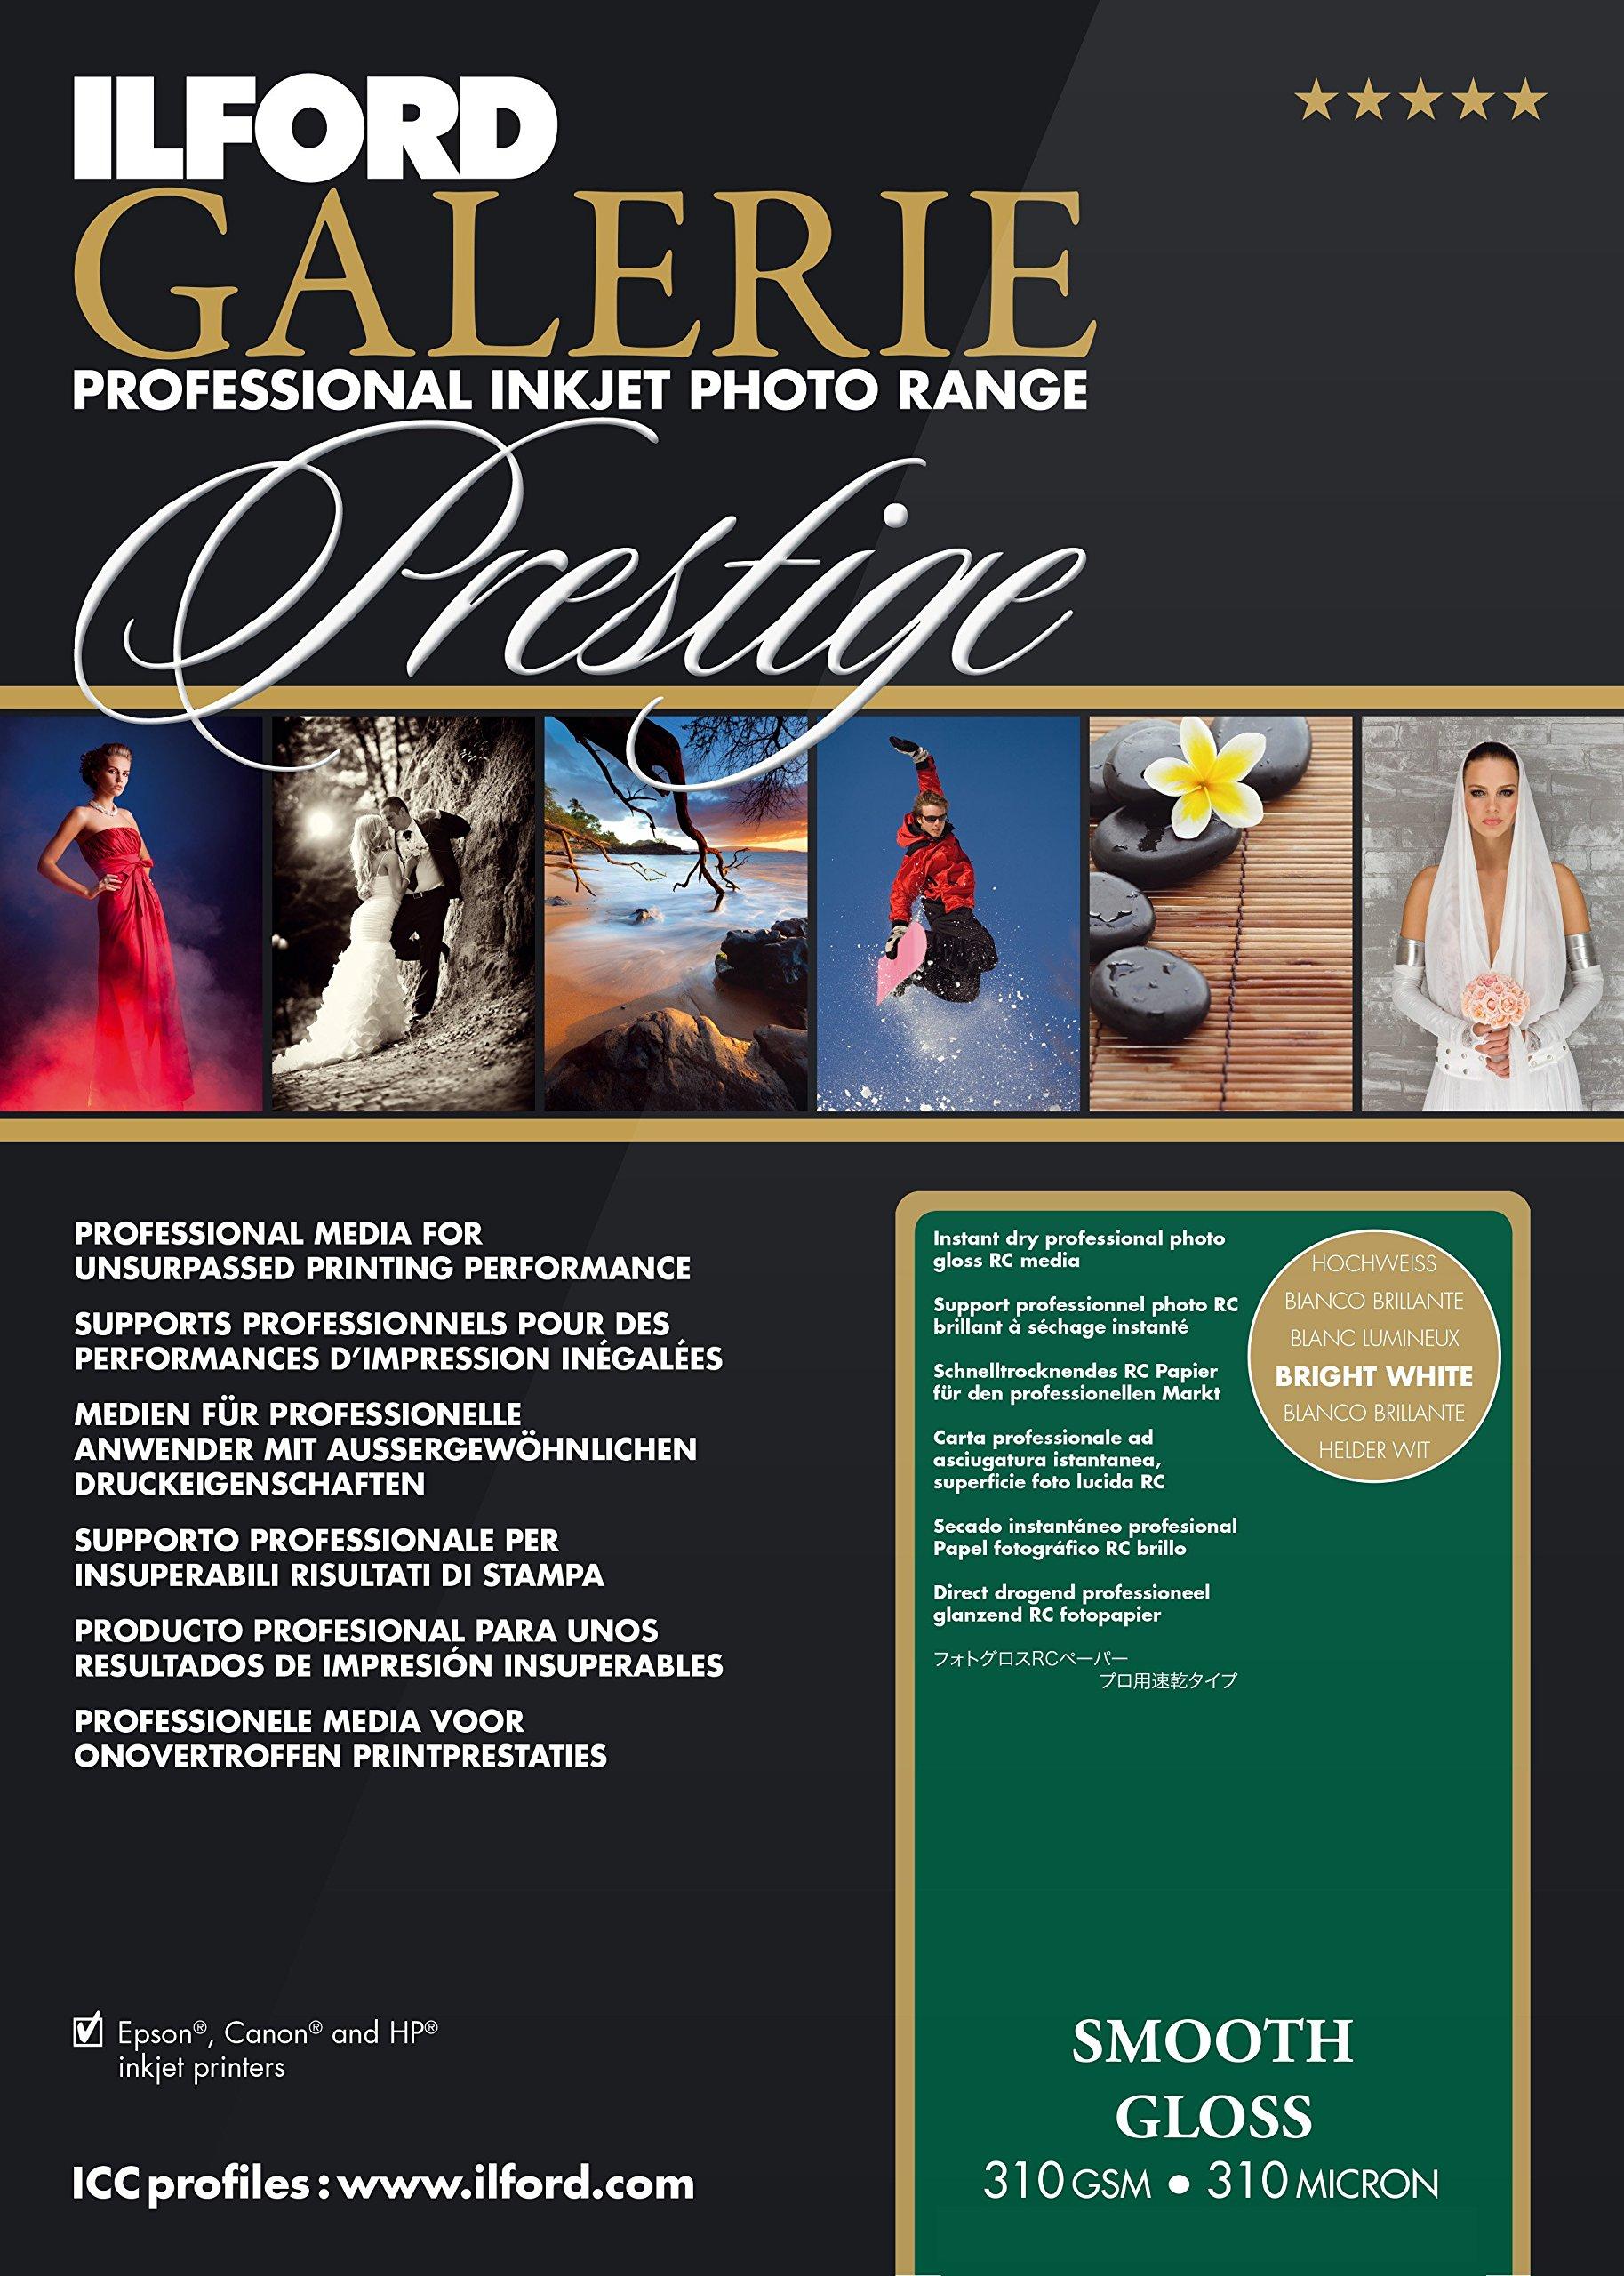 ILFORD 2001893 GALERIE Prestige Smooth Gloss - 17 Inches x 88.5 Feet Roll